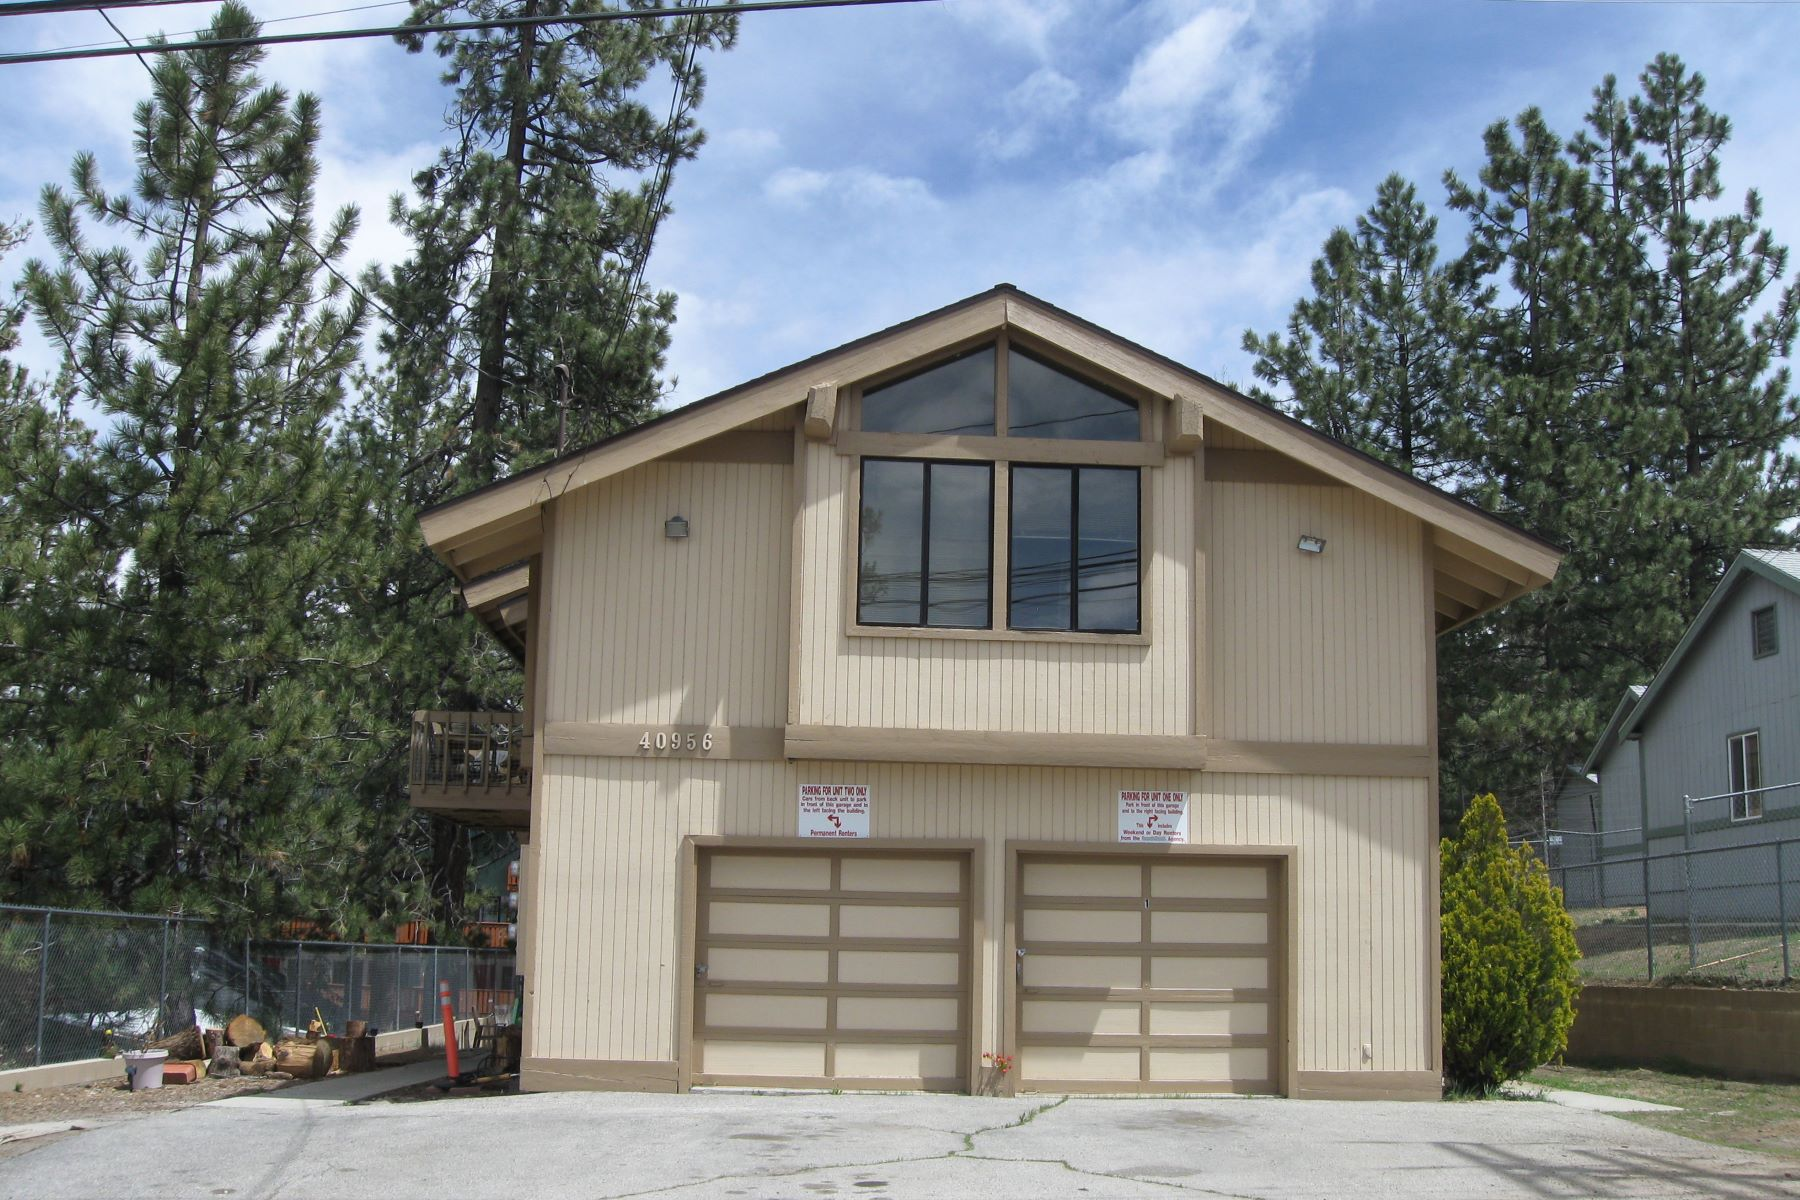 Casa Multifamiliar por un Venta en Big Bear 40956 Pennsylvania Big Bear Lake, California, 92315 Estados Unidos